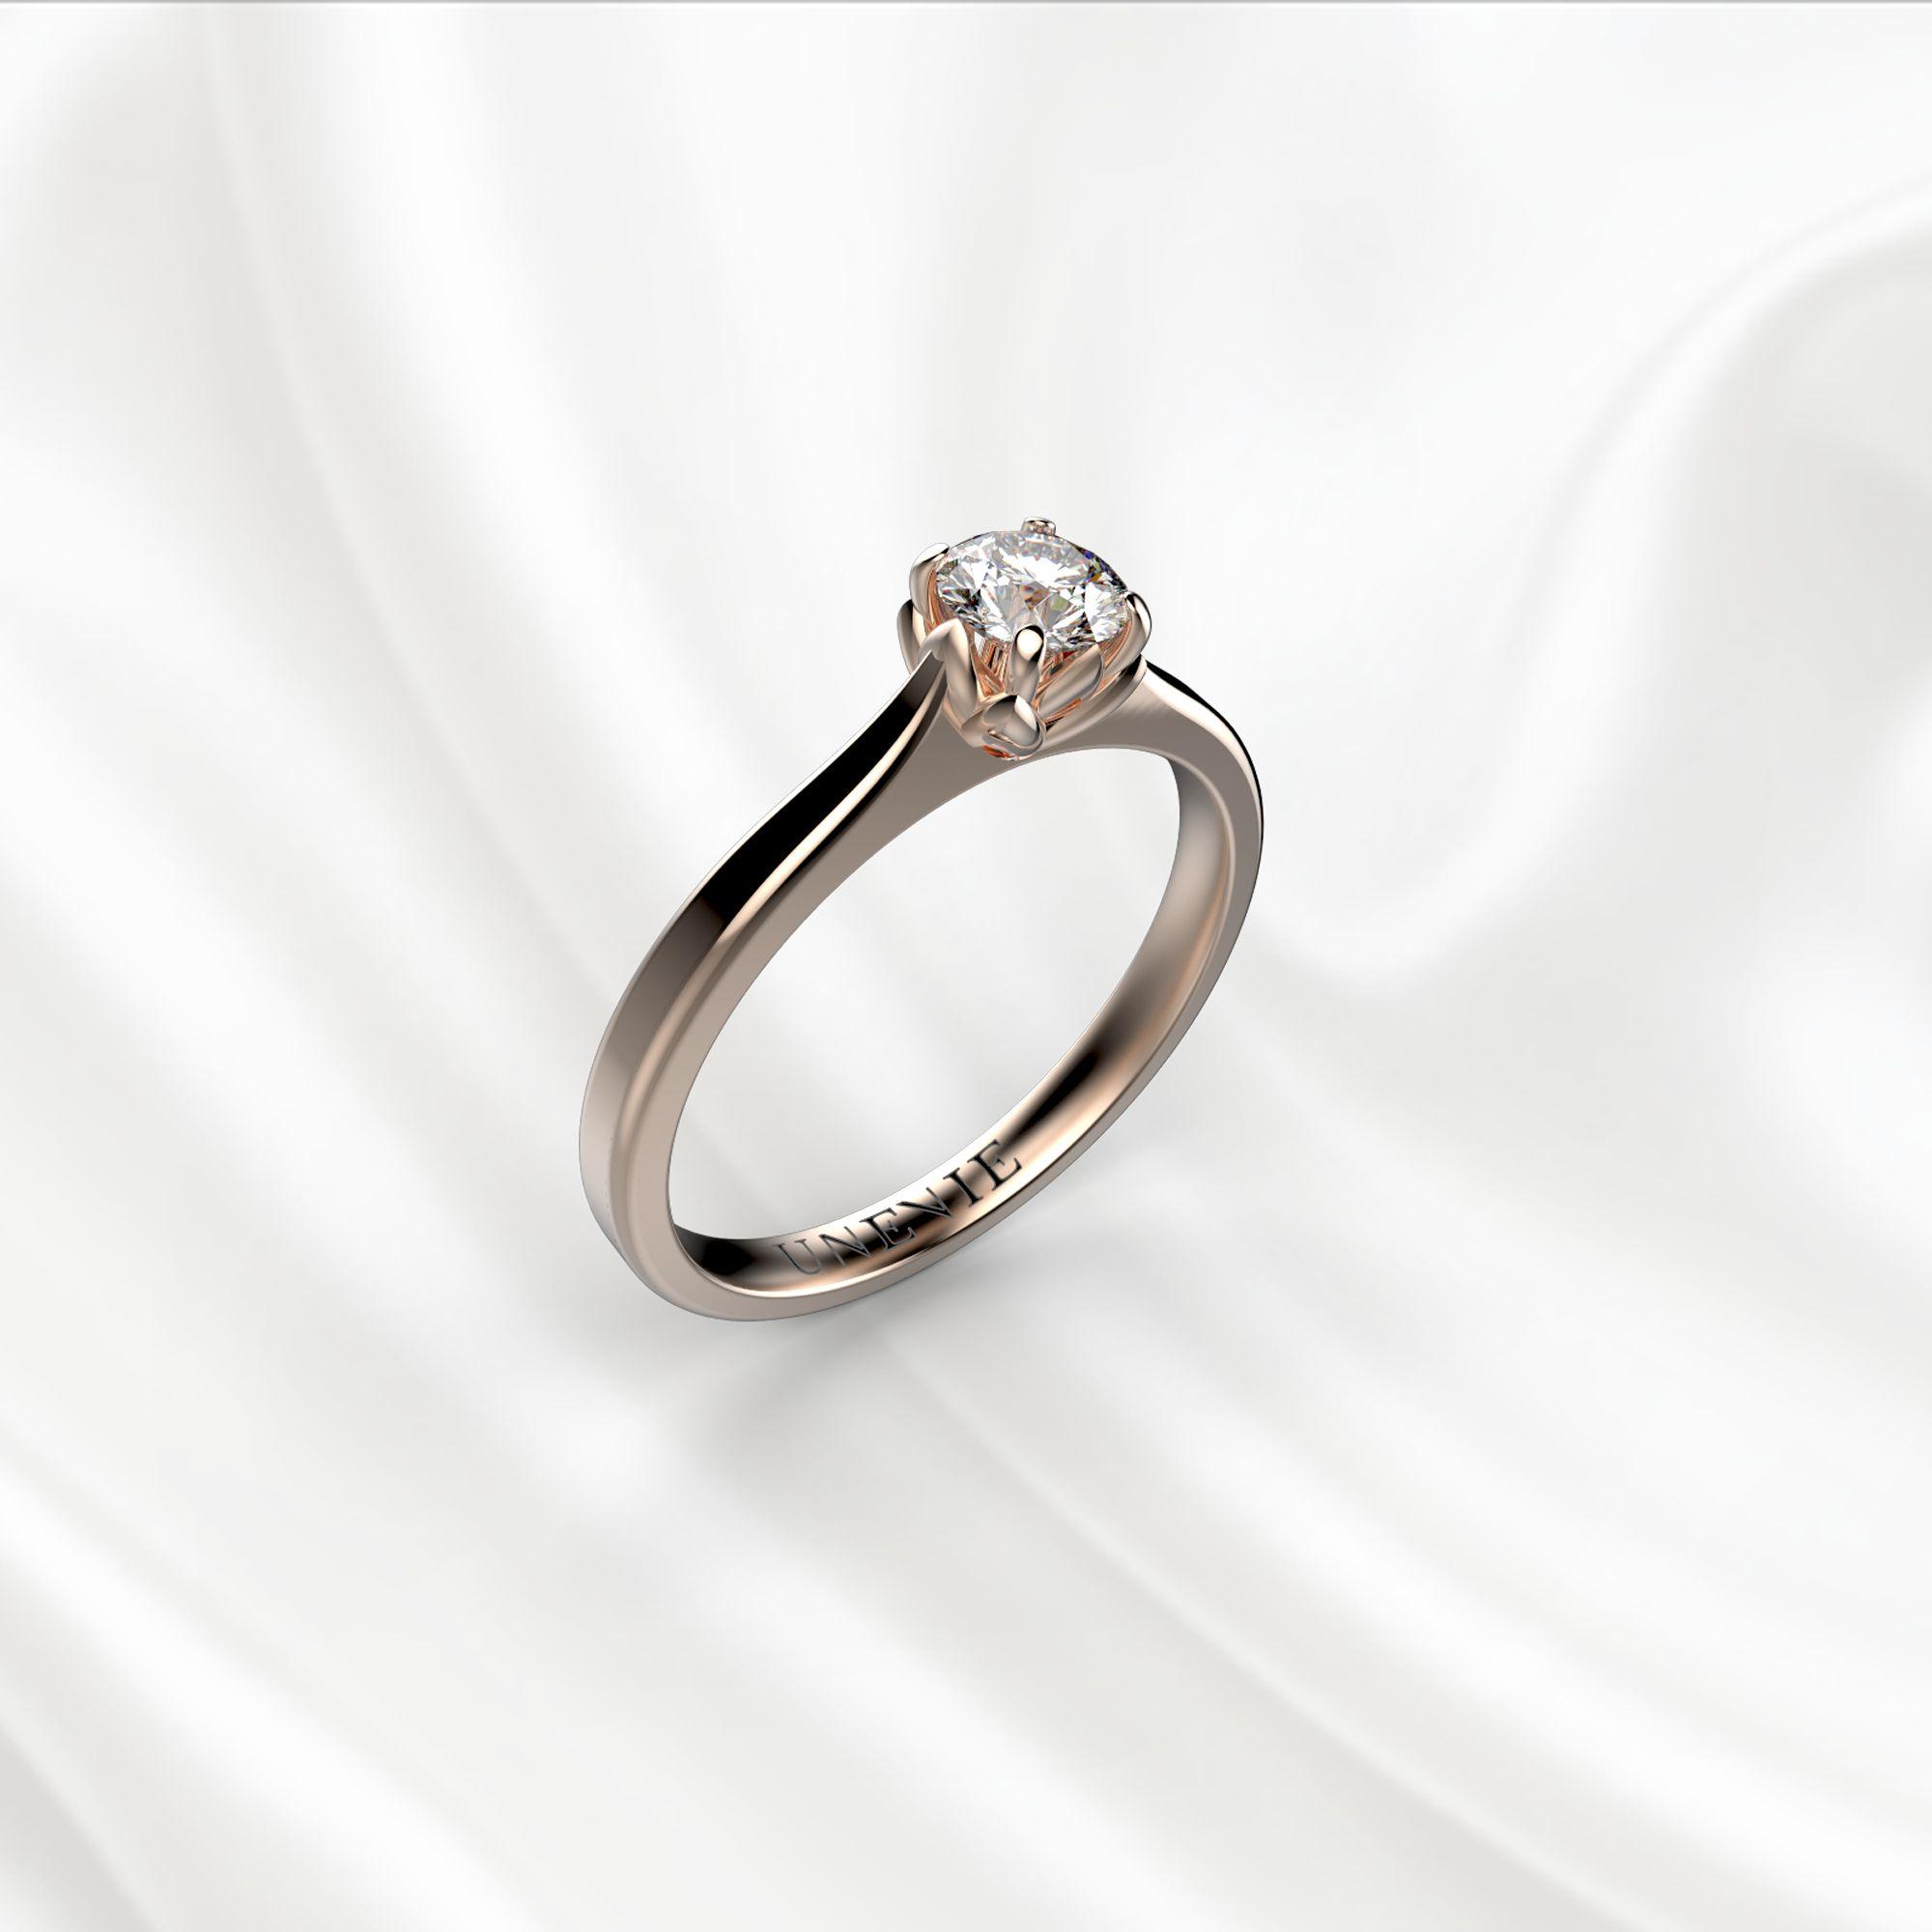 N16-1 Помолвочное кольцо из розового золота с бриллиантом 0.2 карат